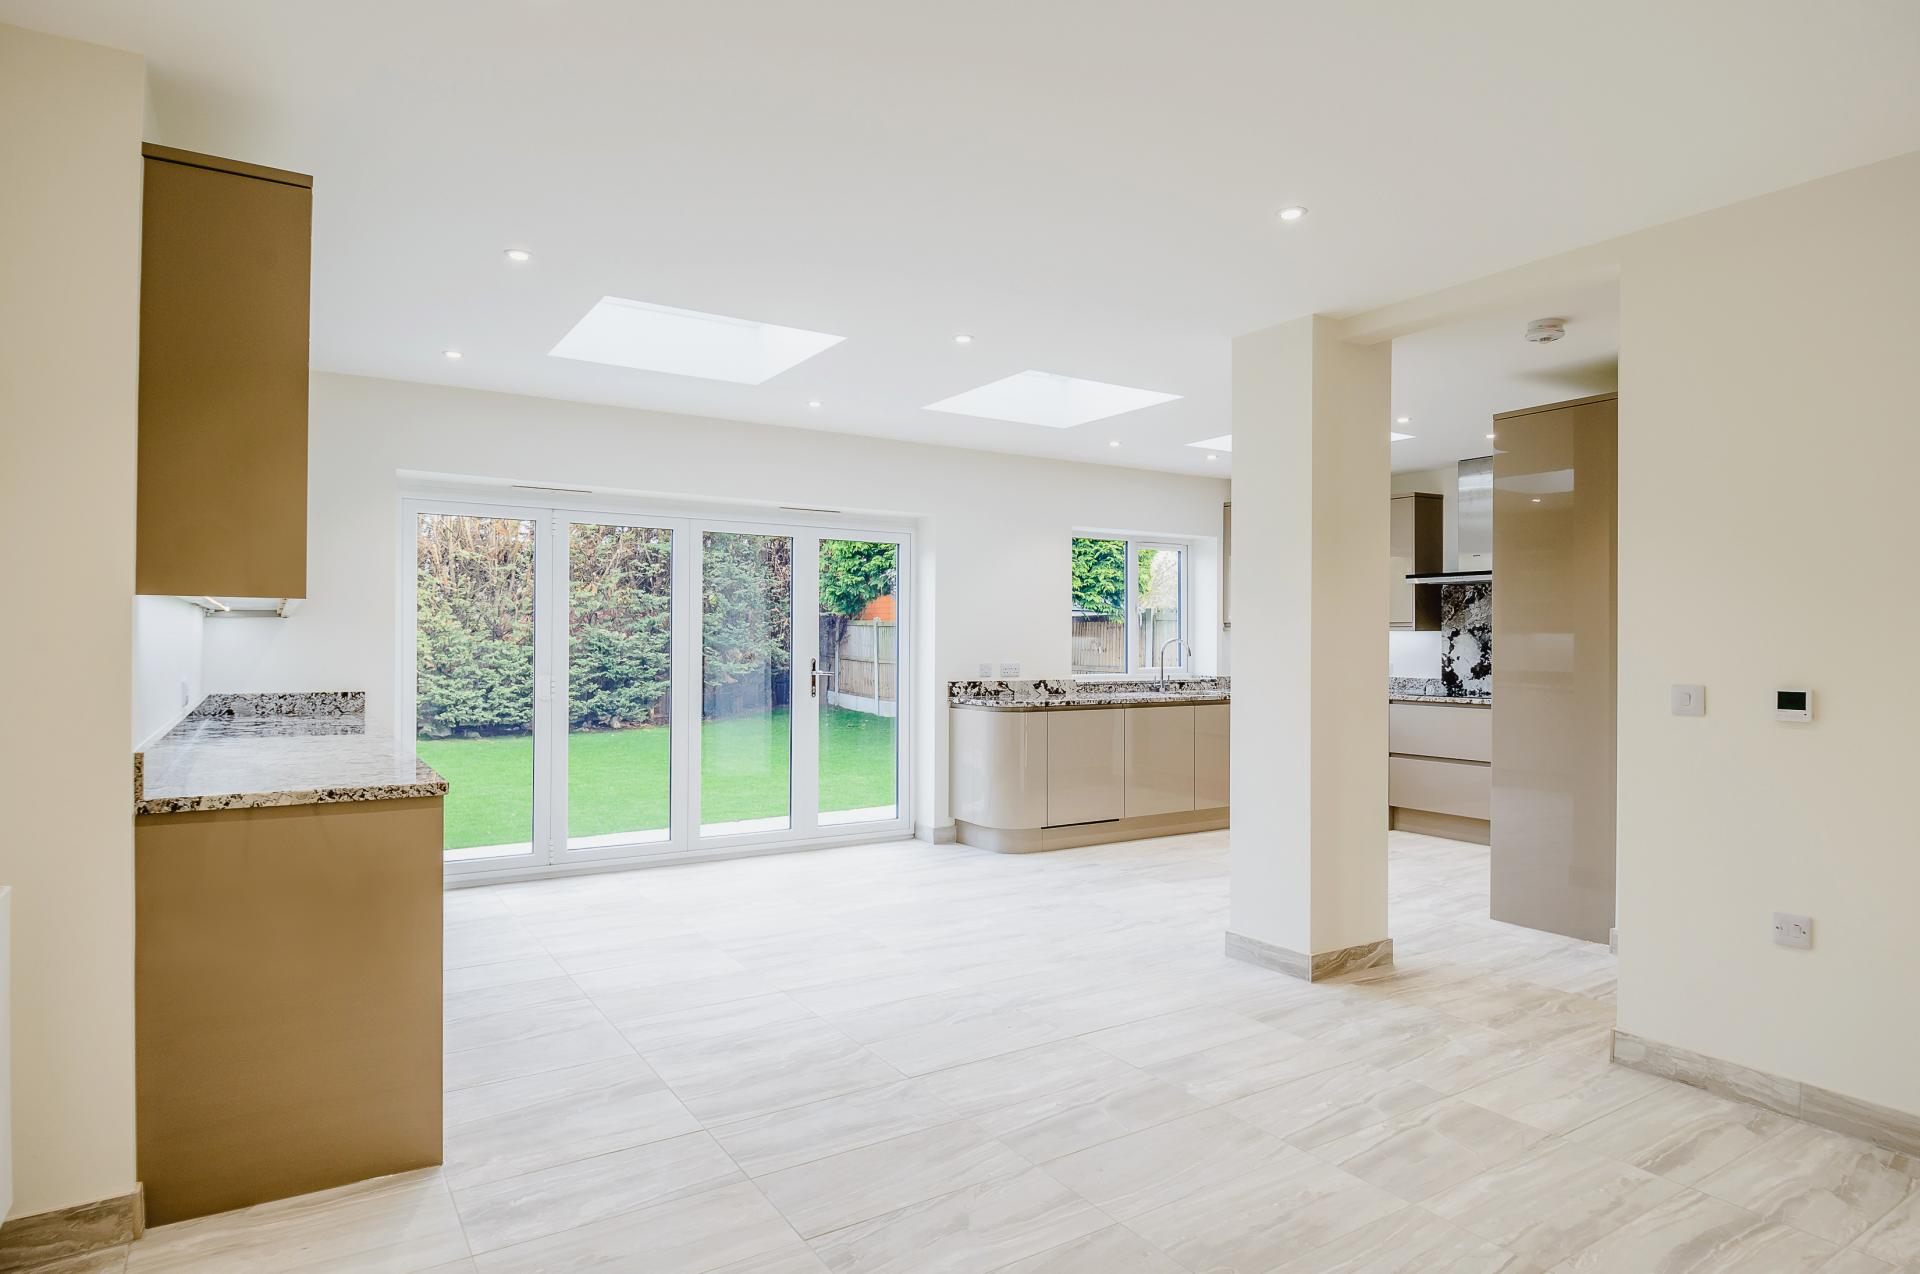 4 bedroom Semi-Detached for sale in Hertfordshire